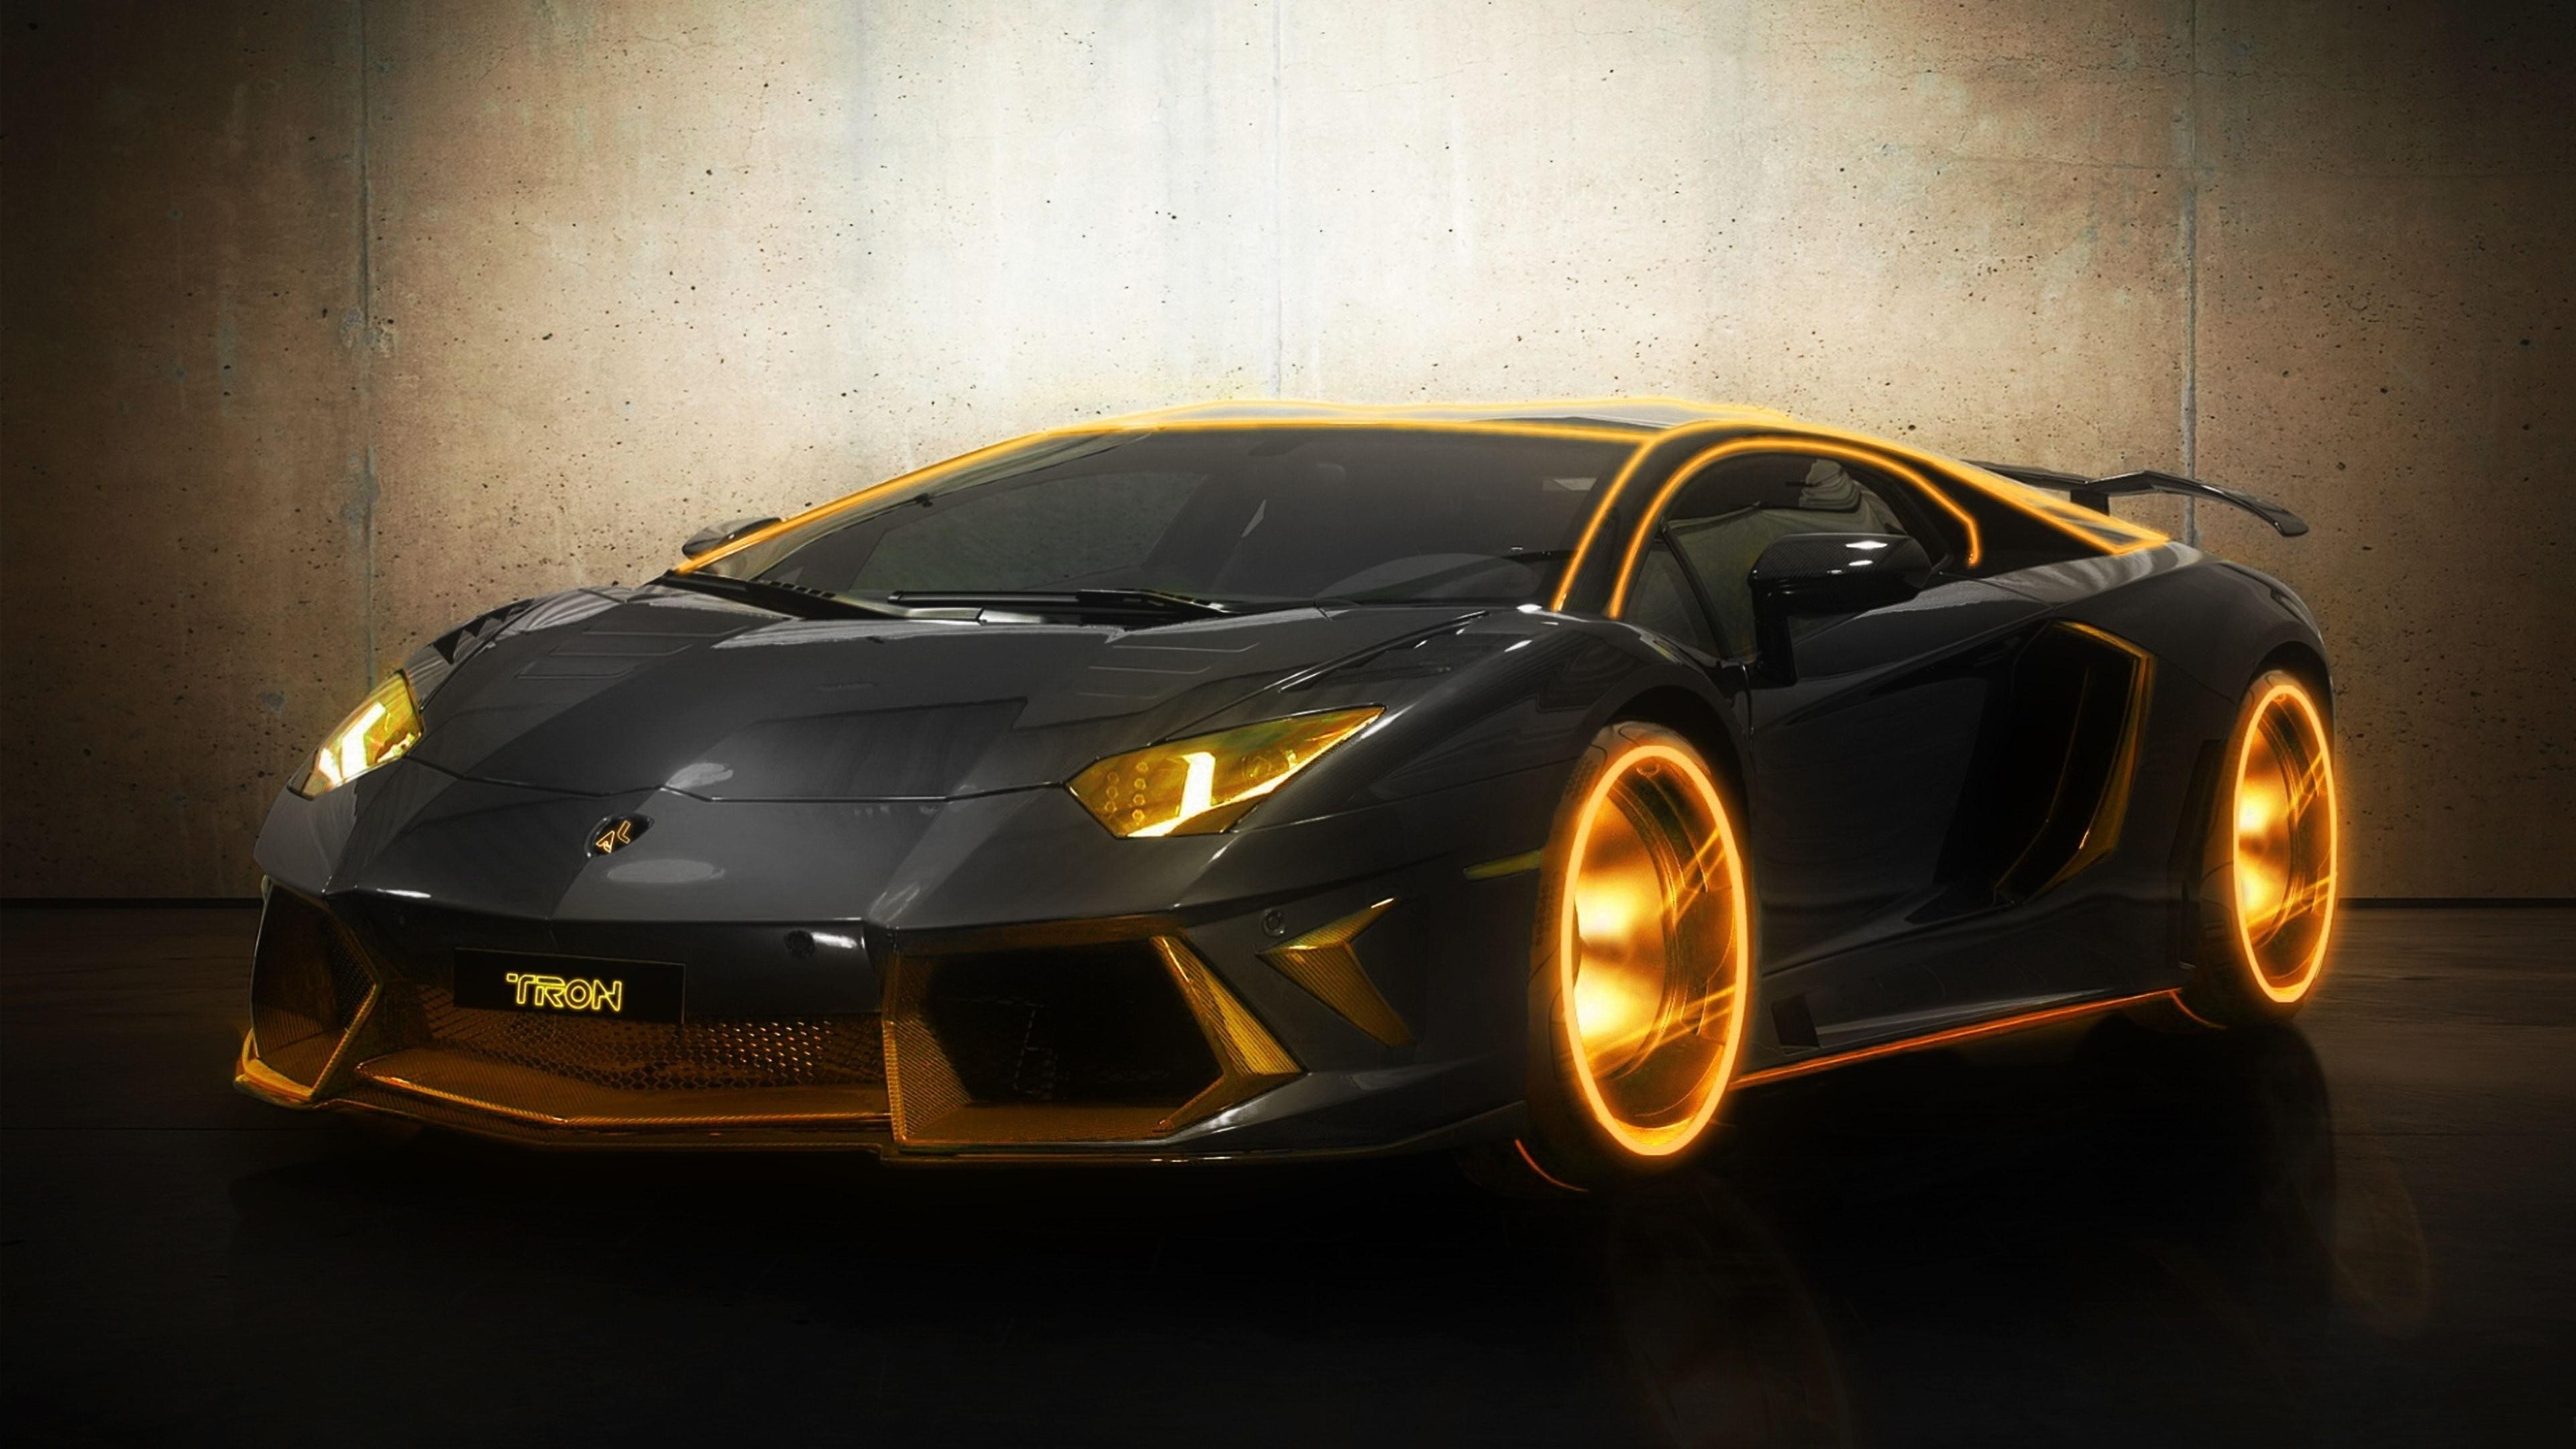 Lamborghini Aventador Car 4k Hd Desktop Wallpaper For 4k: Lamborghini Tron Gold, HD Cars, 4k Wallpapers, Images